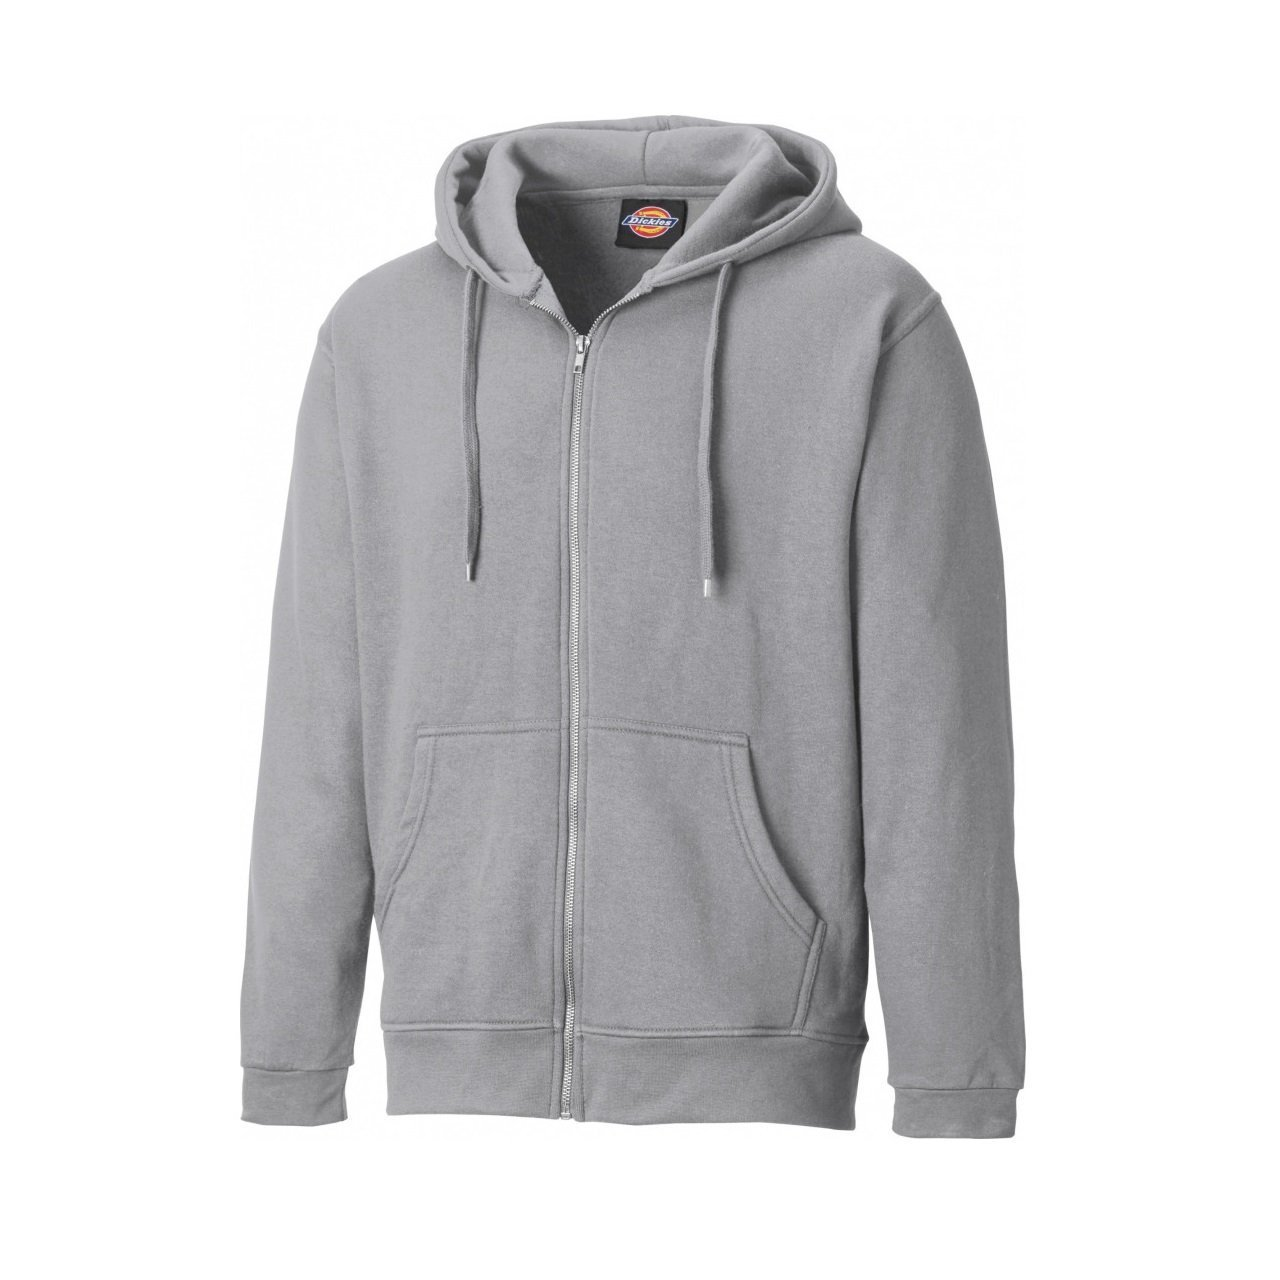 1f45eb7d49adbf Dickies Mens Redwood Polycotton Full Zip Lined Hooded Sweatshirt:  Amazon.co.uk: Sports & Outdoors